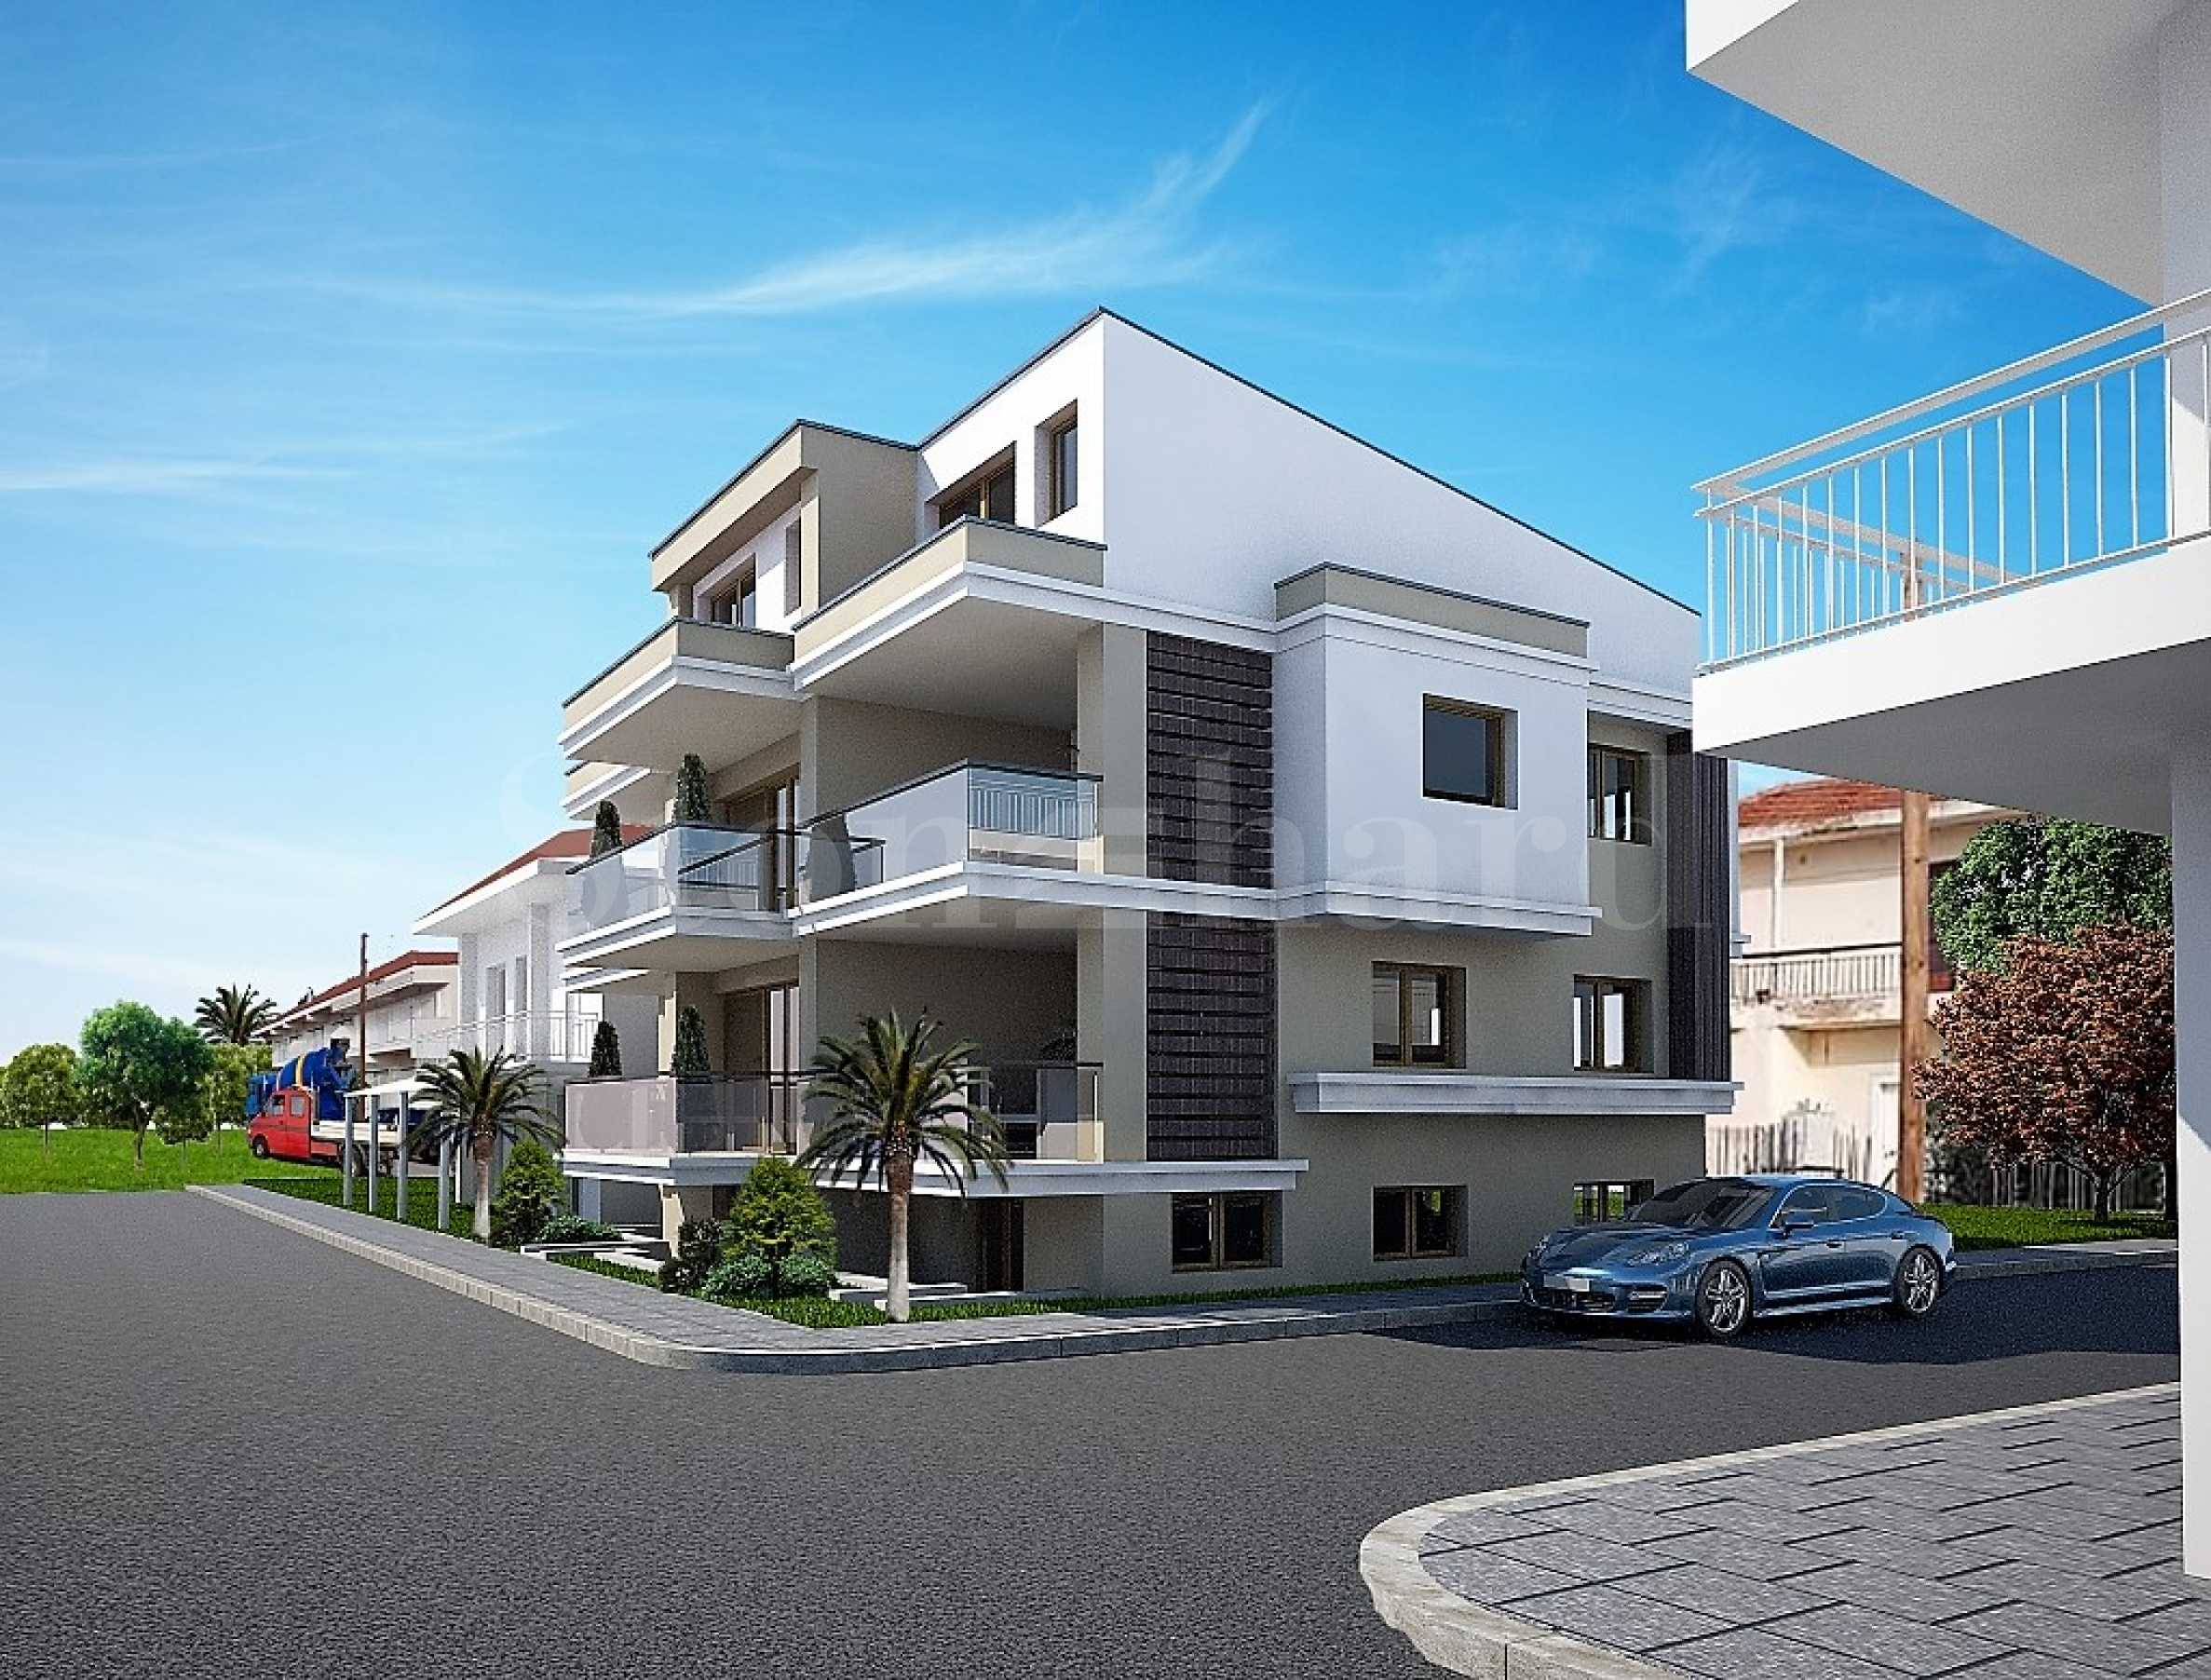 2-bedroom apartment in 2 - Stonehard